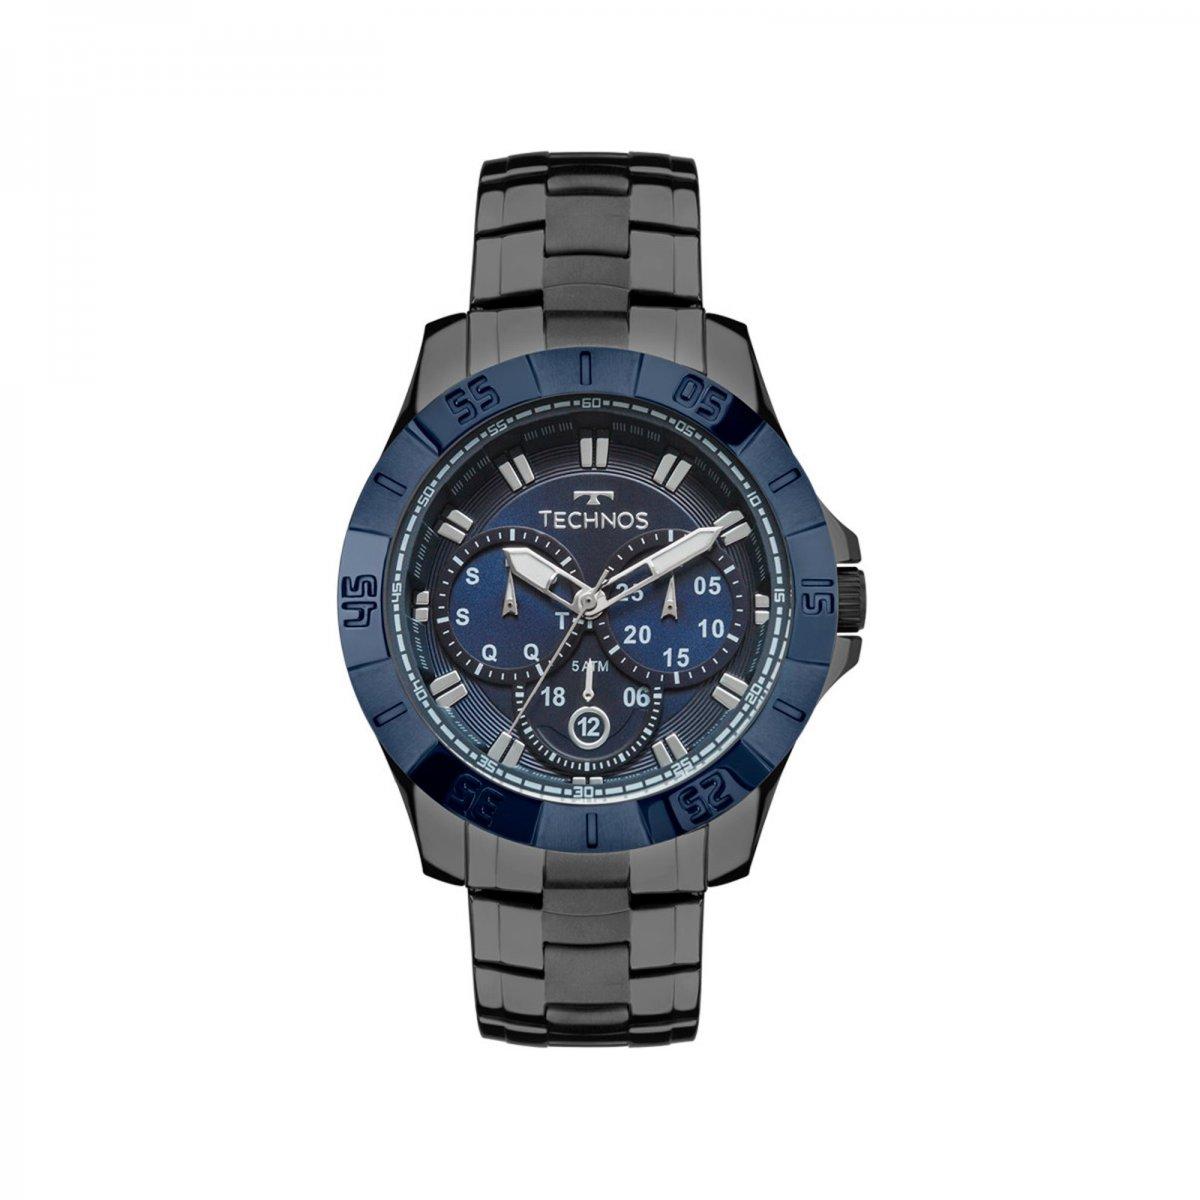 44c858716c6d0 Relógio Technos Analógico Skymaster Masculino 6P79BE 4C Zuazen